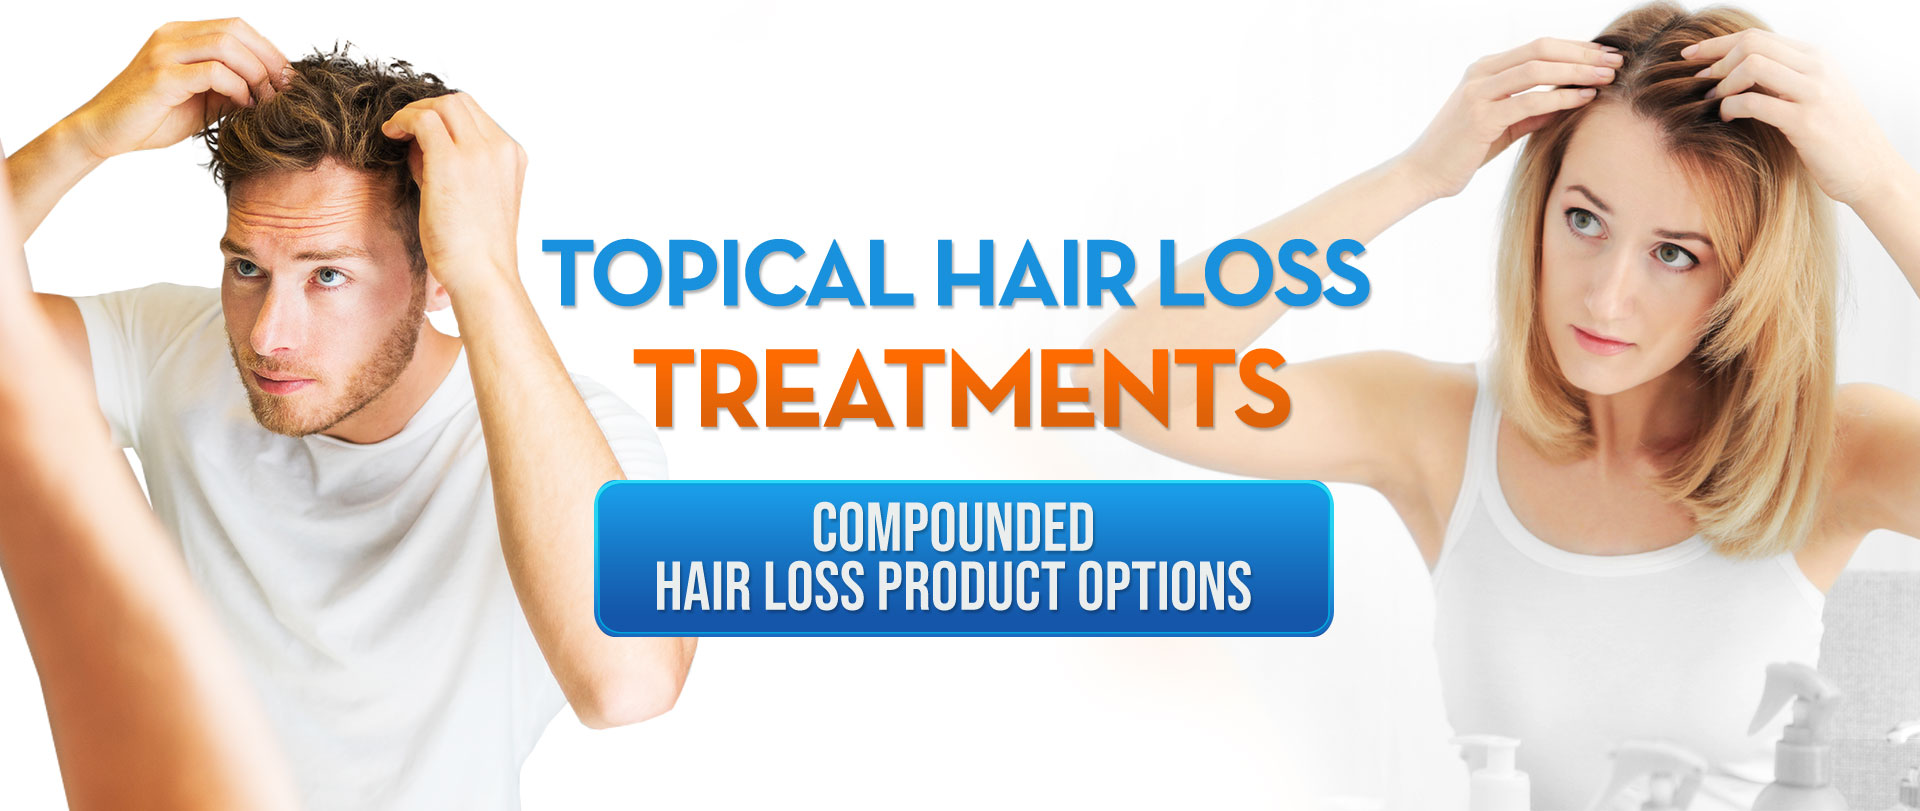 Custom Hair Loss Compounds